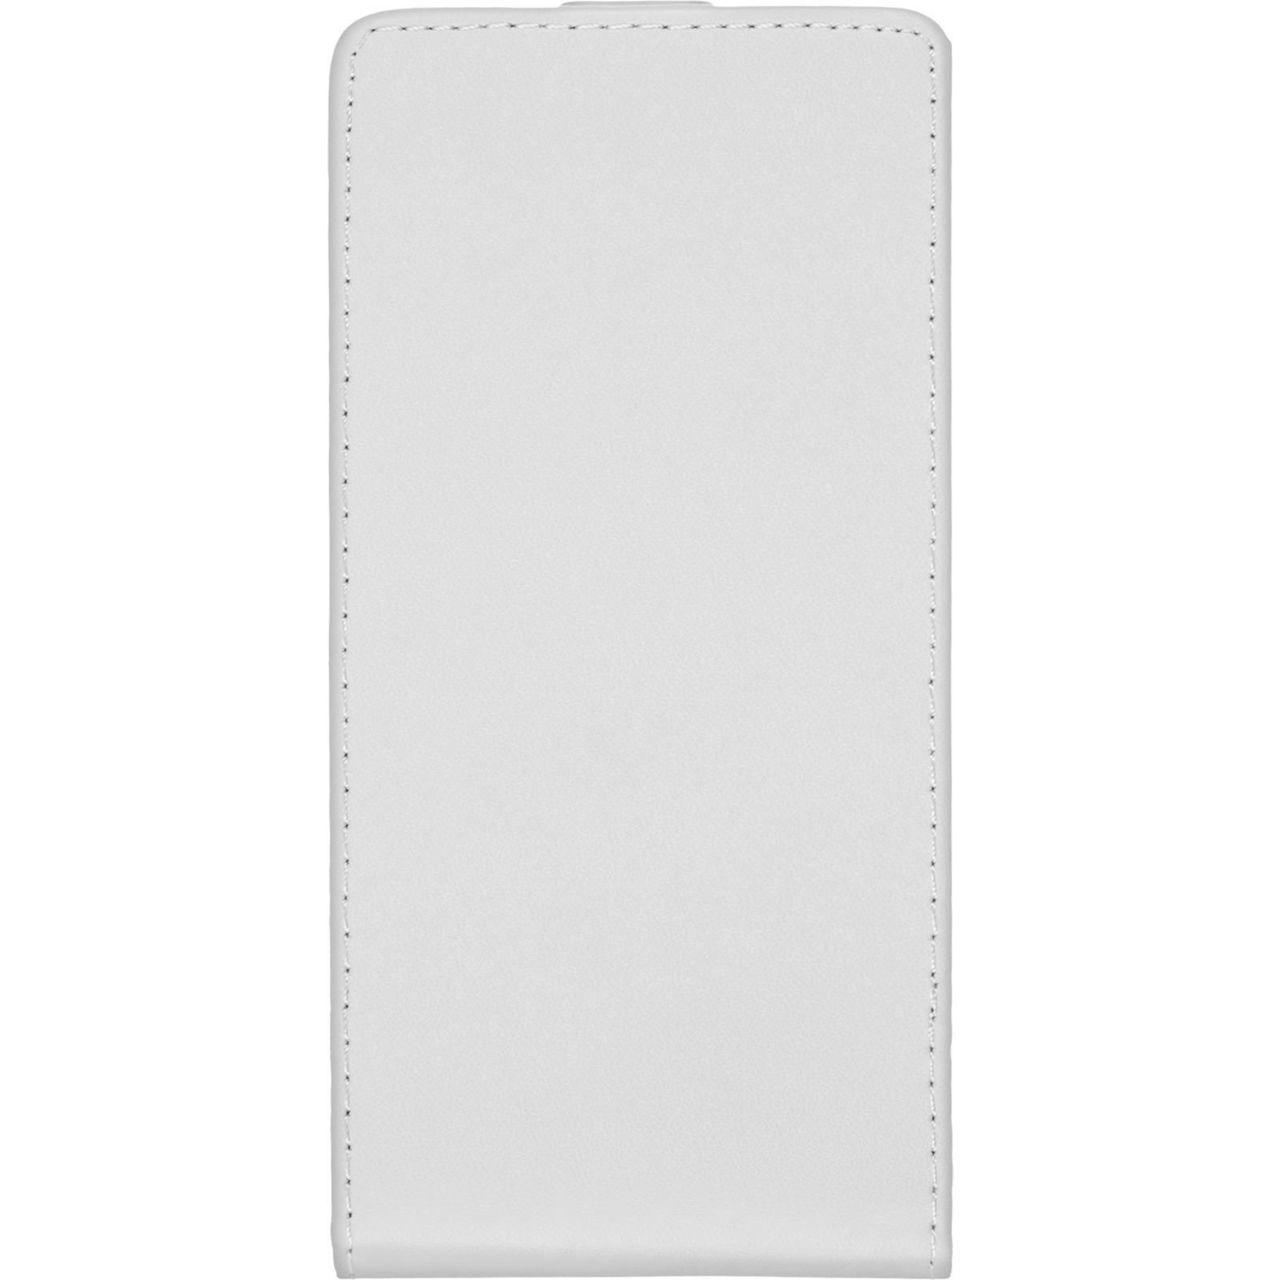 Флиппер белый для Xperia E4G купить в Sony Centre Воронеж